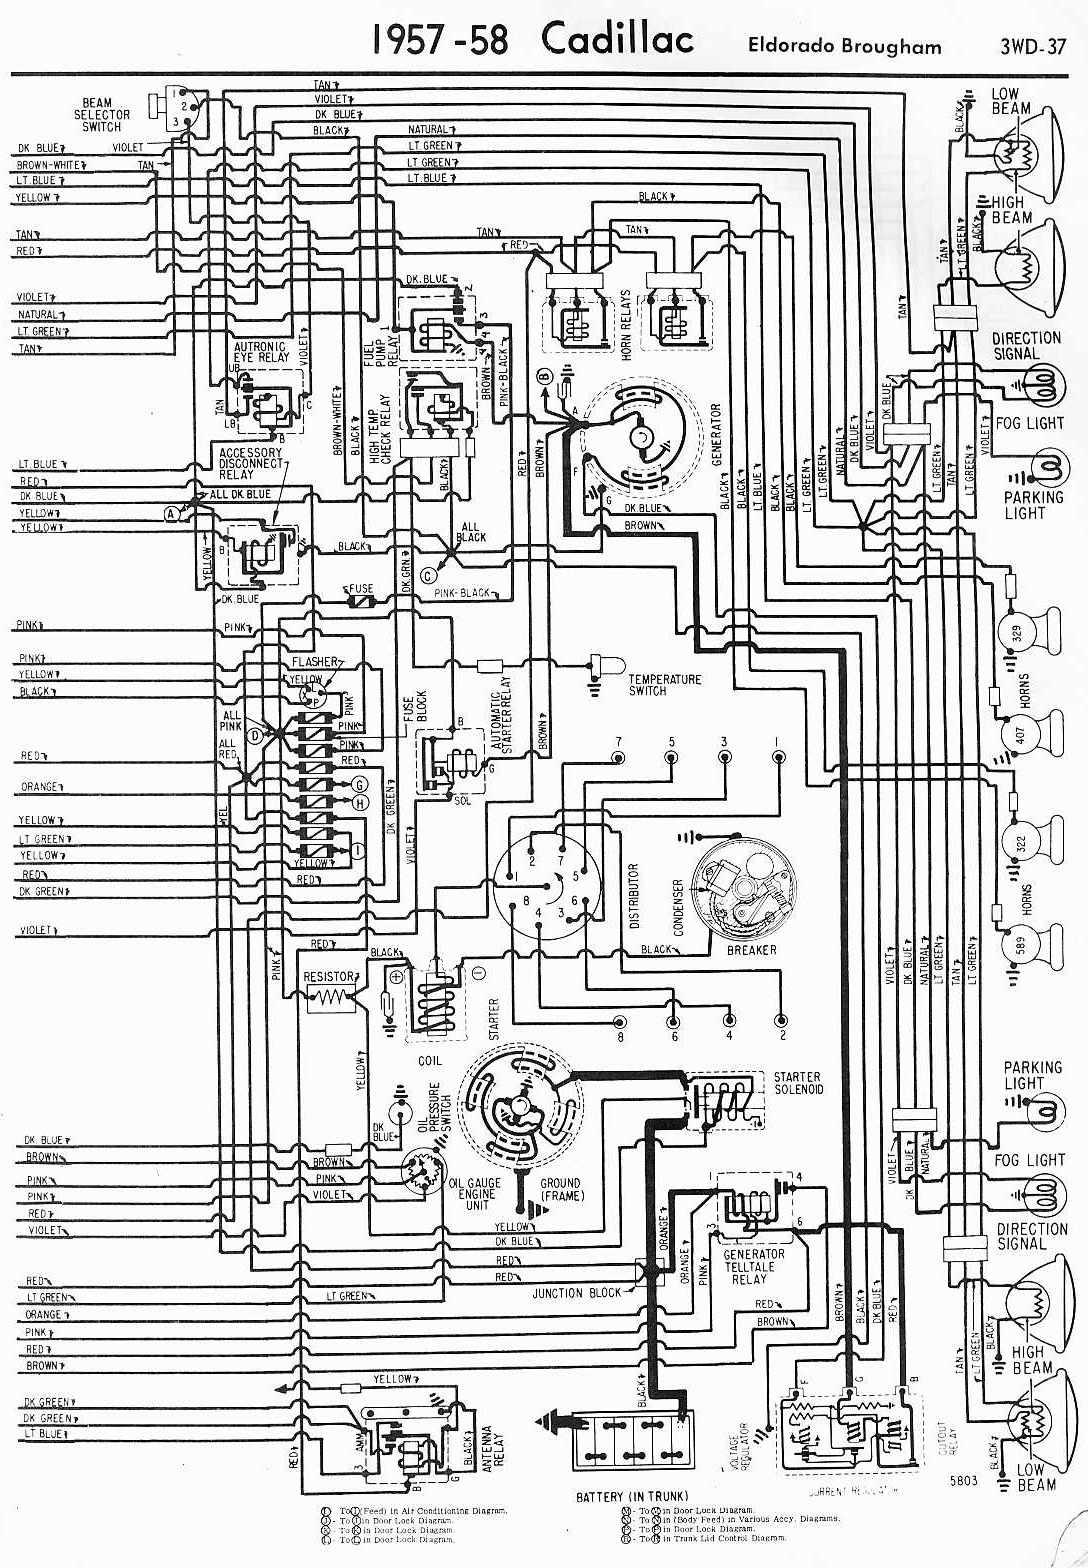 CADILLAC - Car PDF Manual, Wiring Diagram & Fault Codes DTC | 2004 Cadillac Deville Wiring Diagram |  | CAR PDF Manuals & Fault Codes DTC